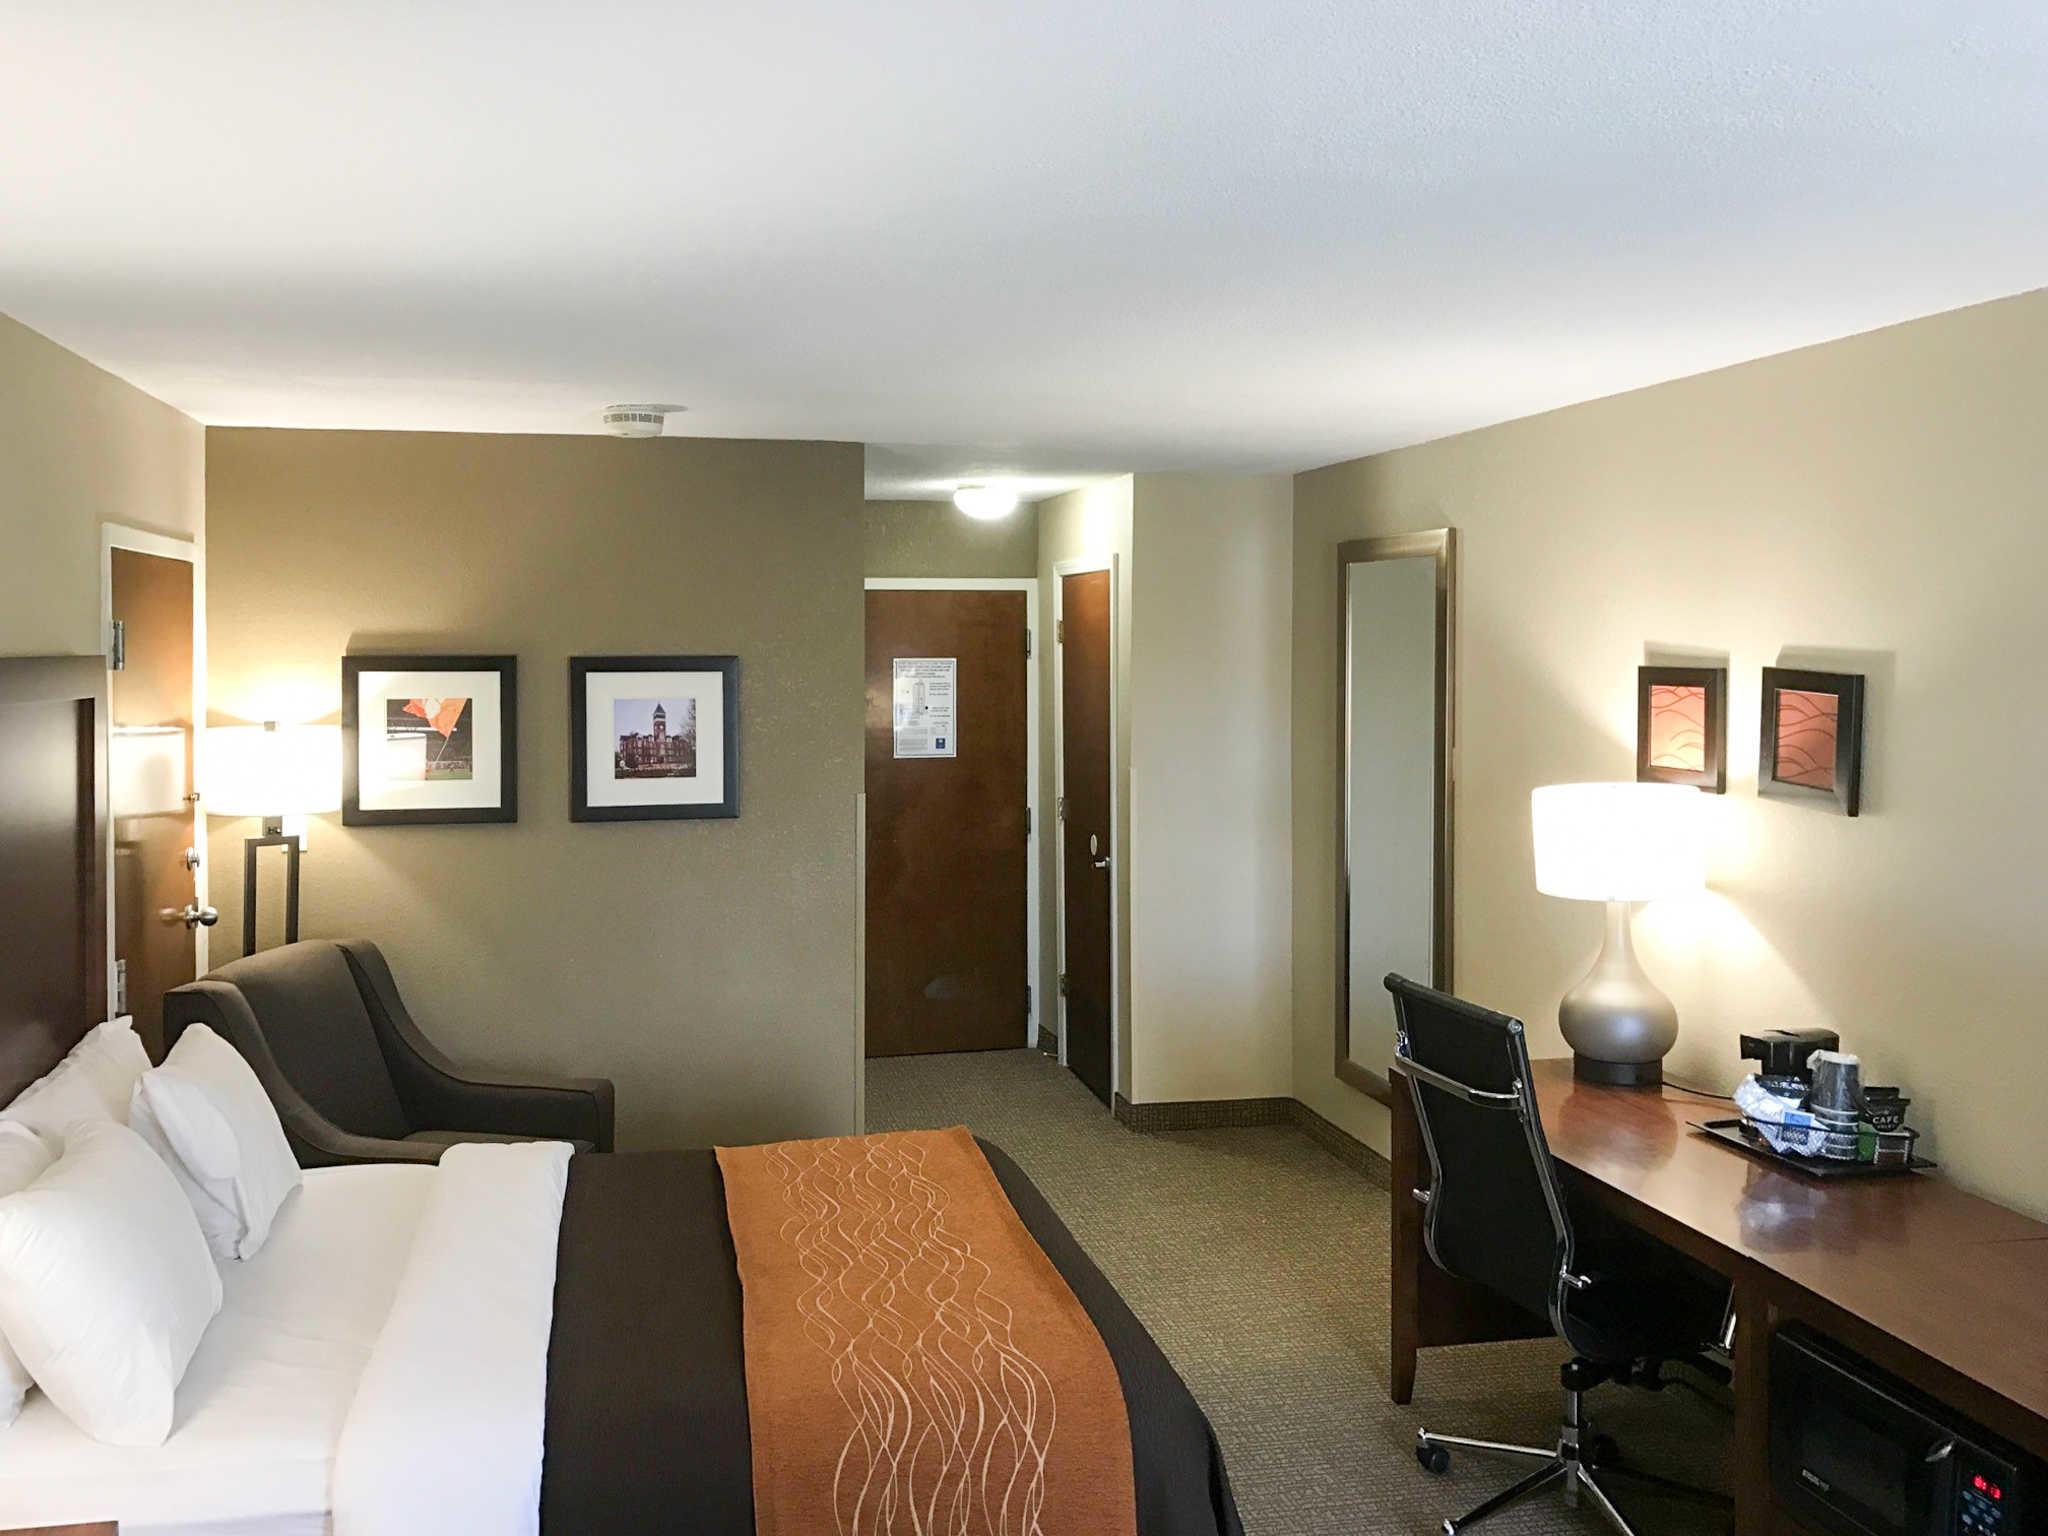 Hotel Rooms In Clemson Sc